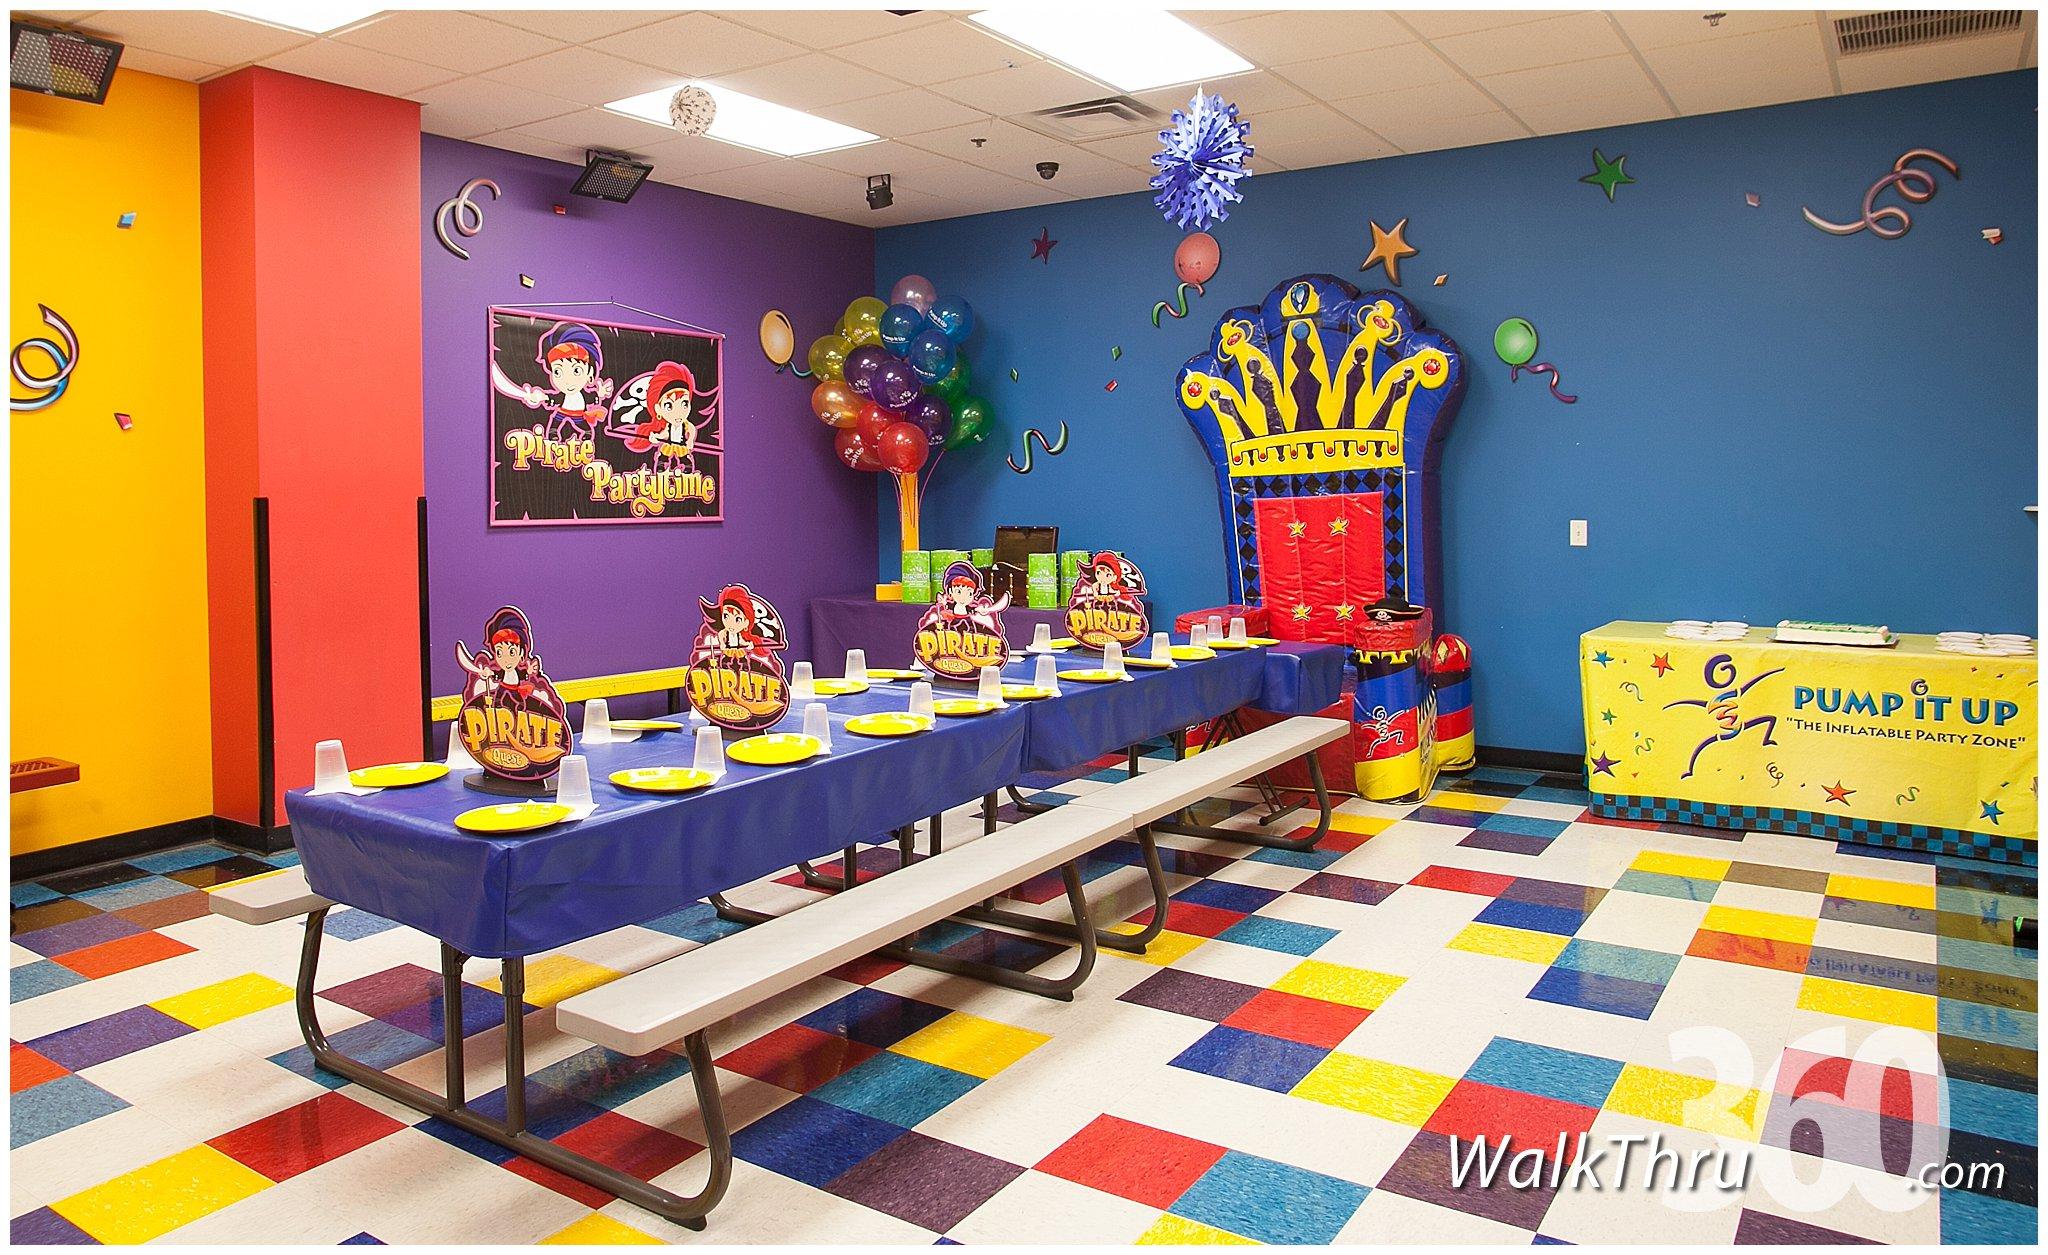 Pump It Up Kids Entertainment Lincoln Park  Virtual Tour by WalkThru360  WalkThru360  Google